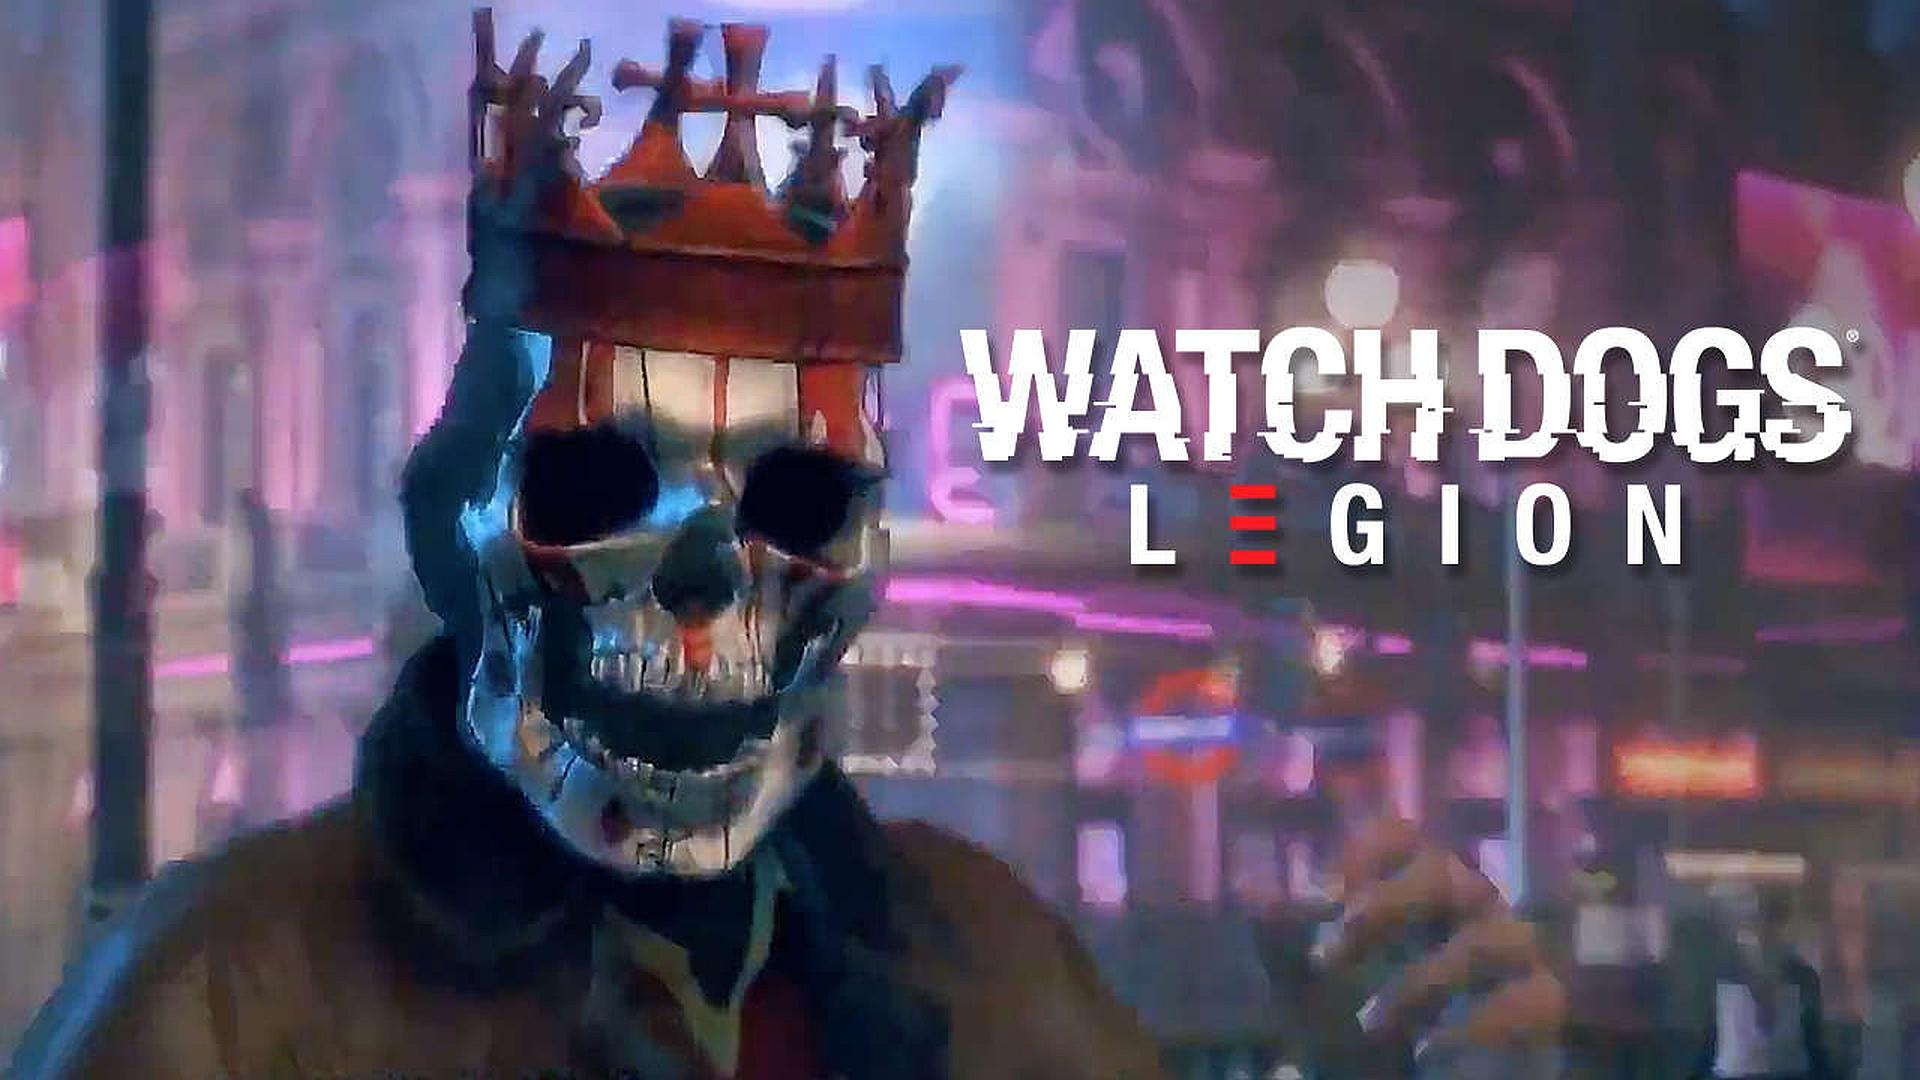 Watch Dogs: Legion HD Wallpapers - Wallpaper Cave